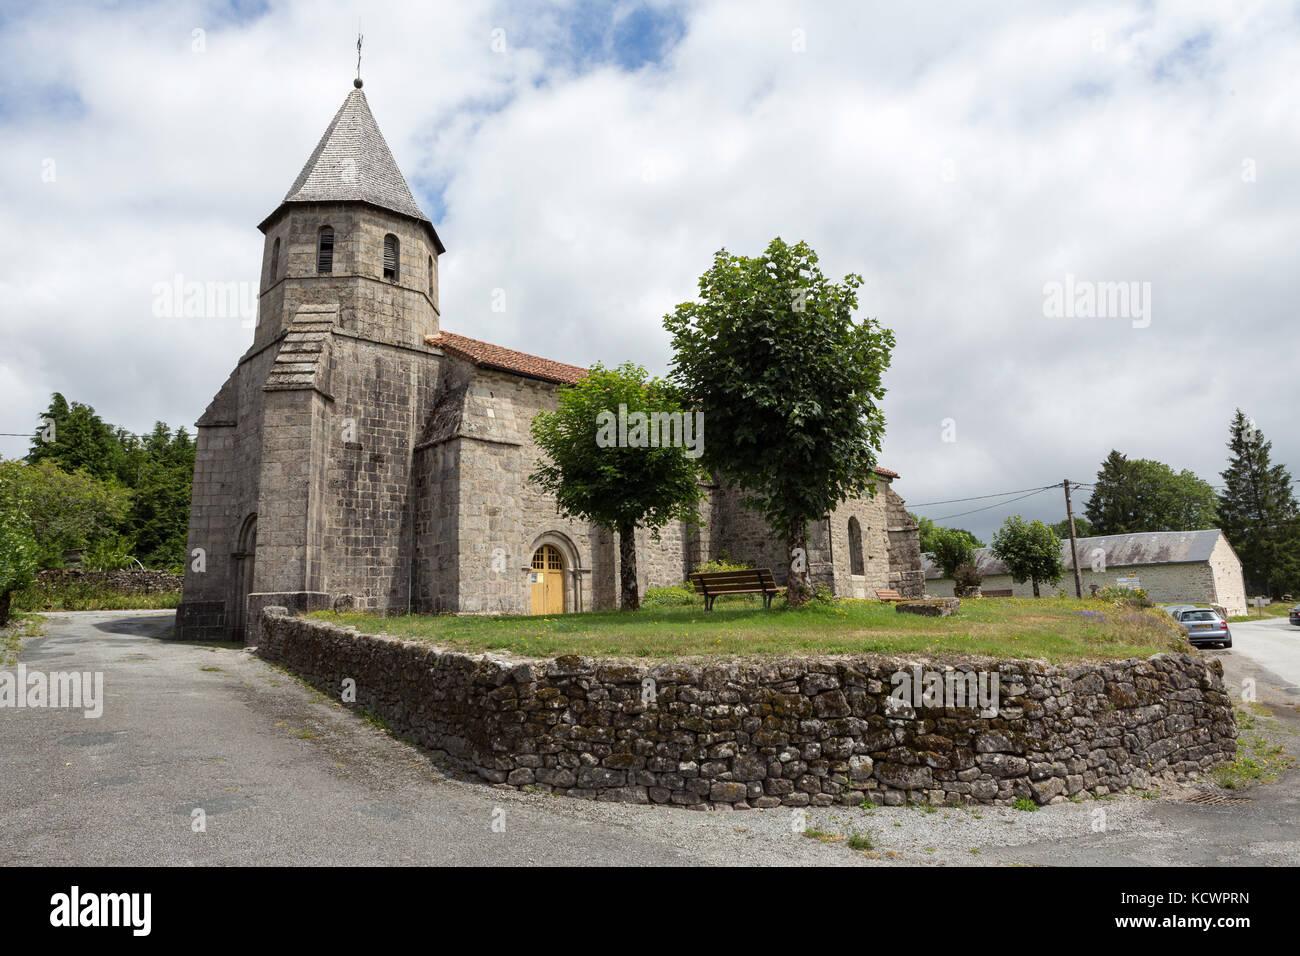 SAINT-GOUSSAUD, FRANCE - JULY 23, 2017: The church of Saint-Goussaud on the Camino De Santiago, the Way of St. James - Stock Image